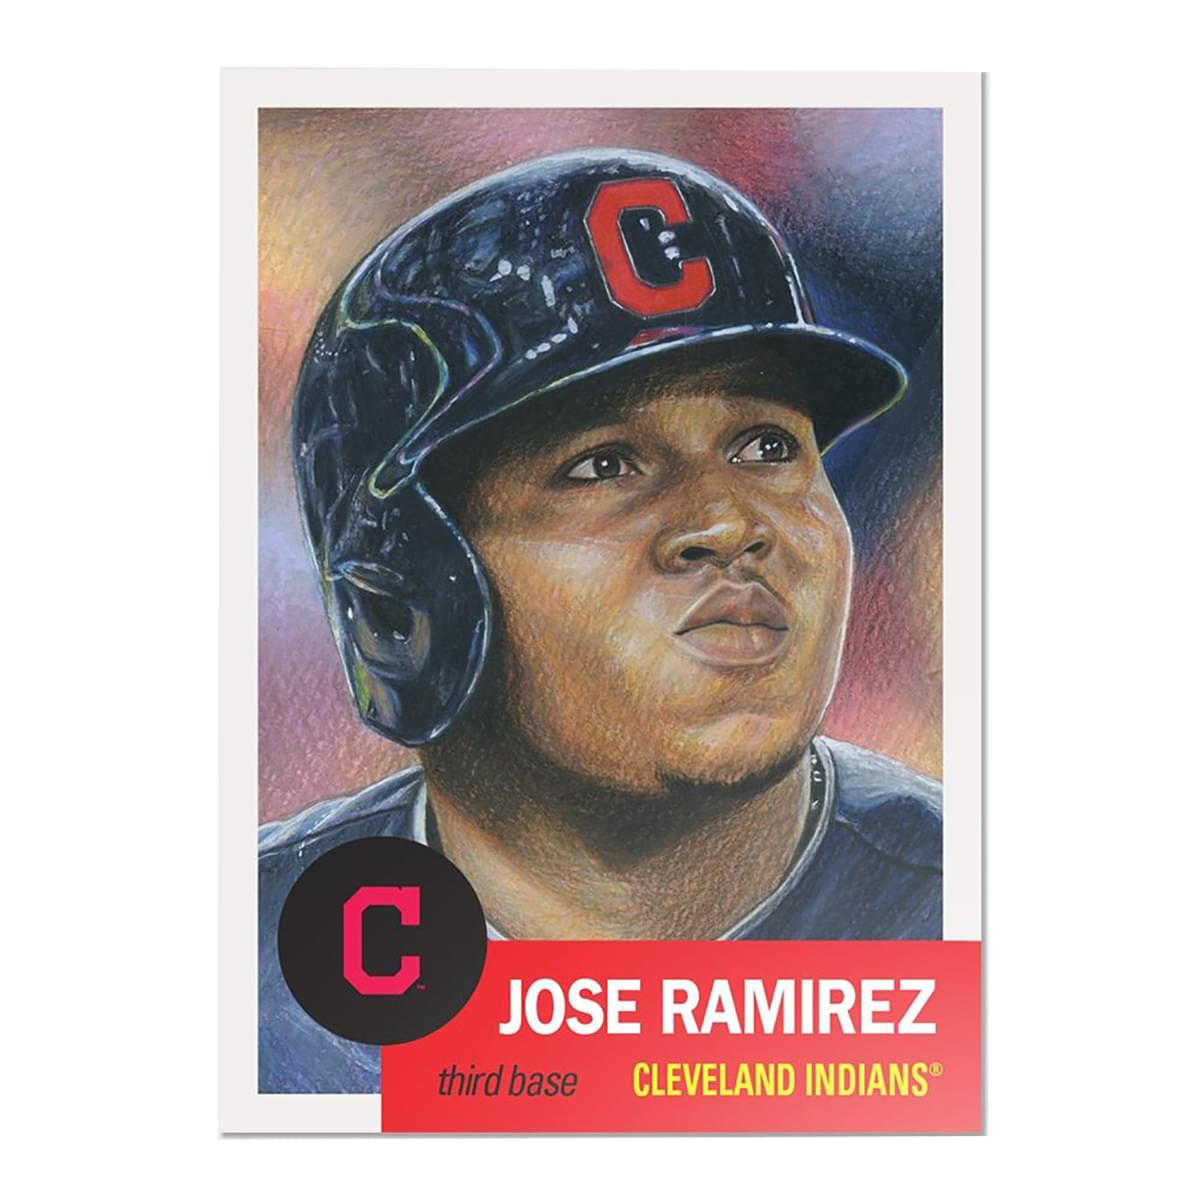 Cleveland Indians #20 Jose Ramirez MLB Topps Living Set Card